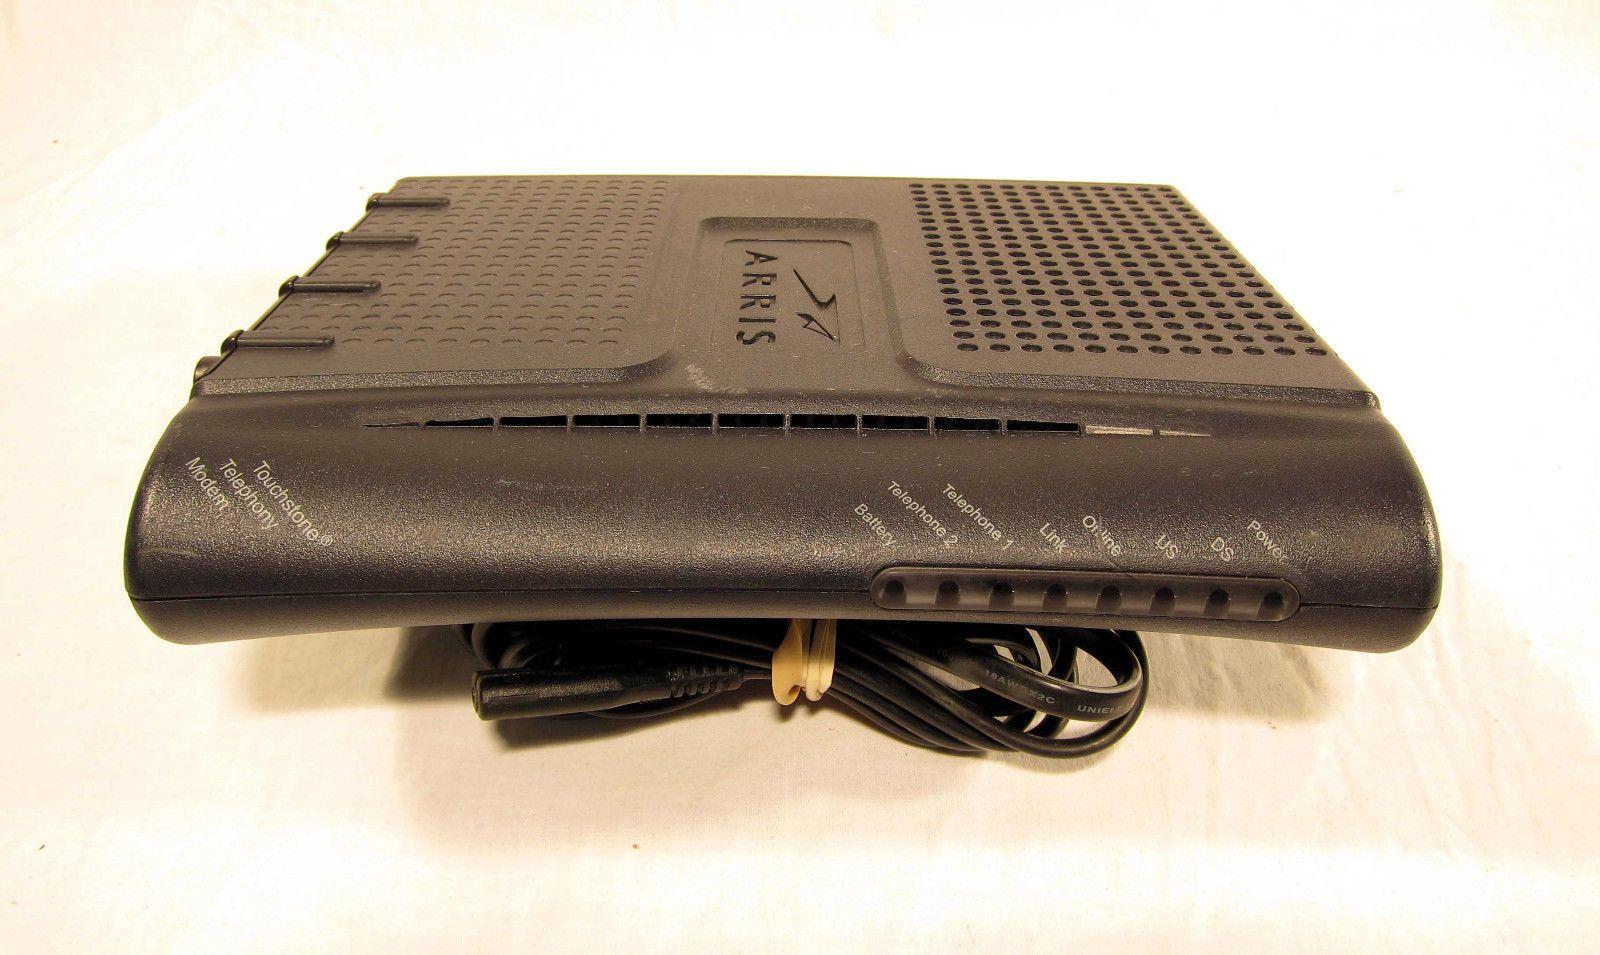 ARRIS TM602G/CT-8 TRK